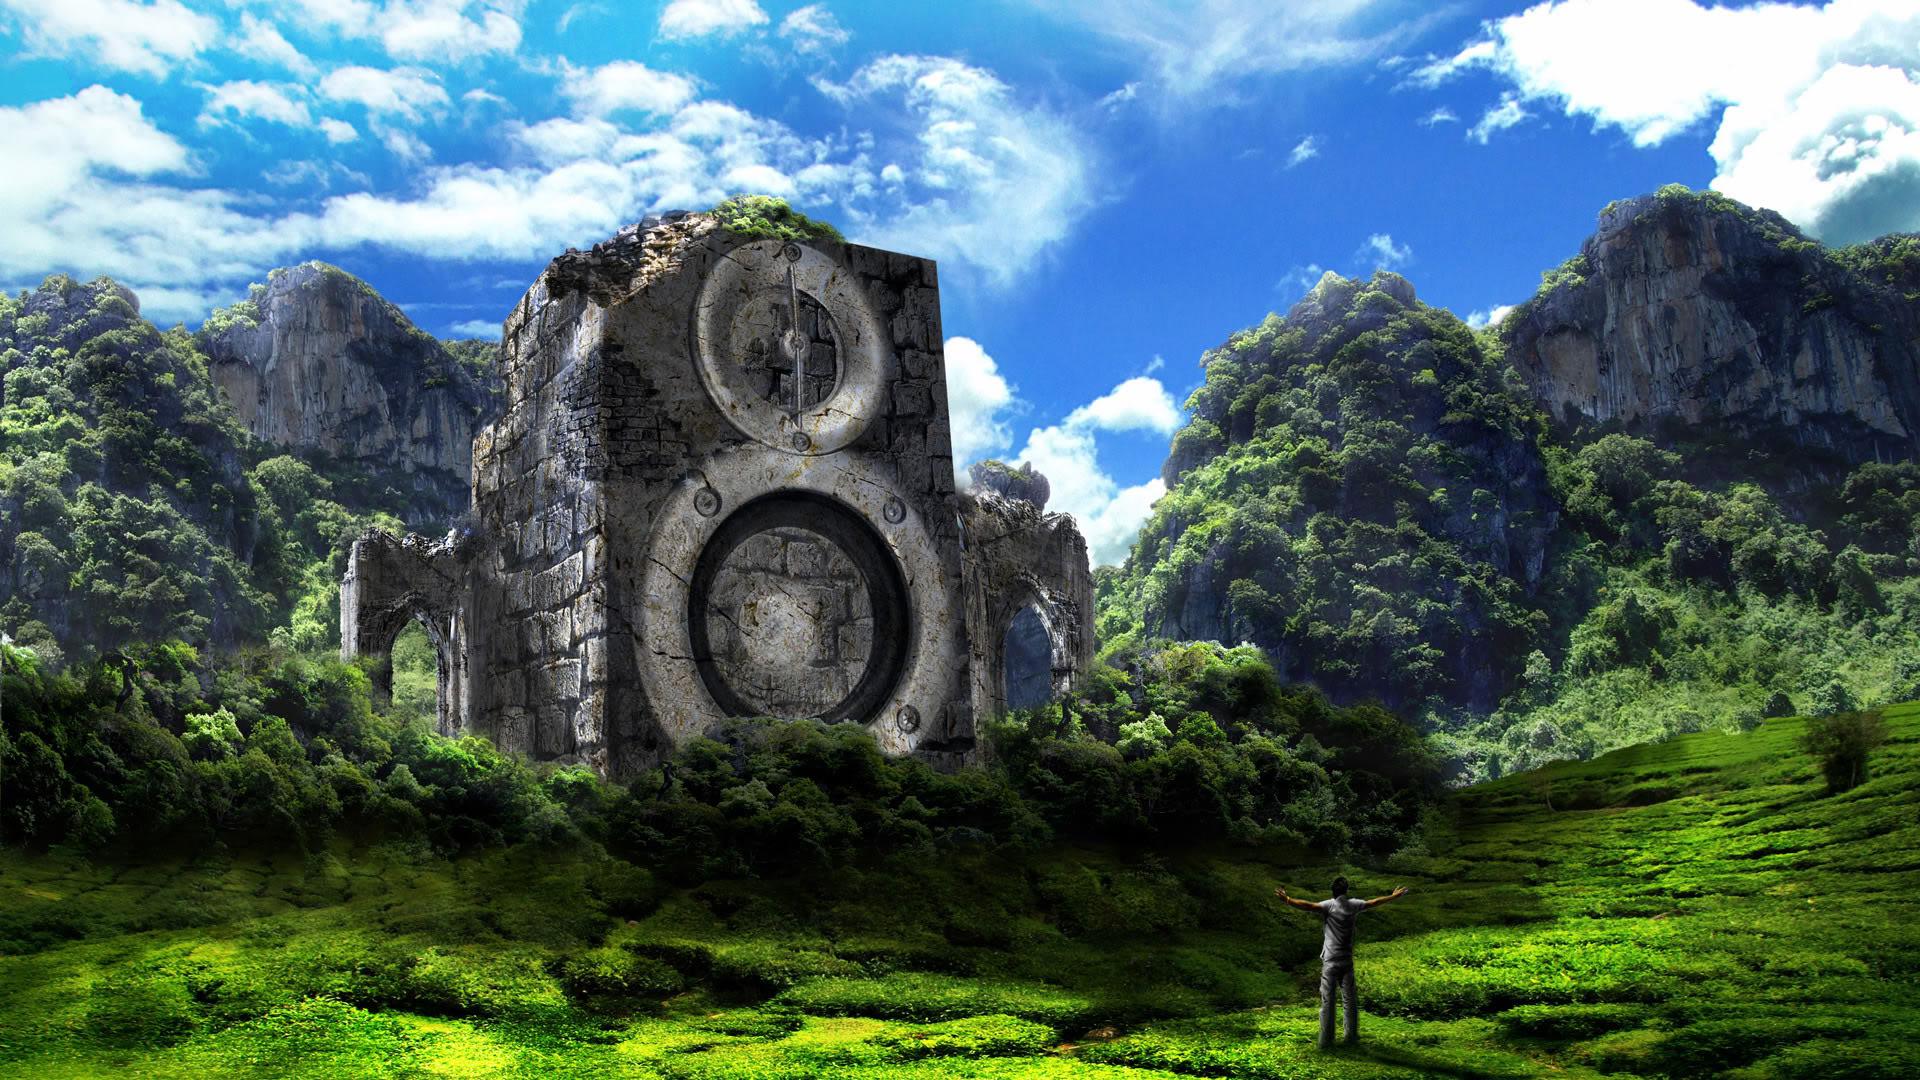 Sfondo hd fantasy wallpaper sfondi hd gratis for Sfondi hd natura